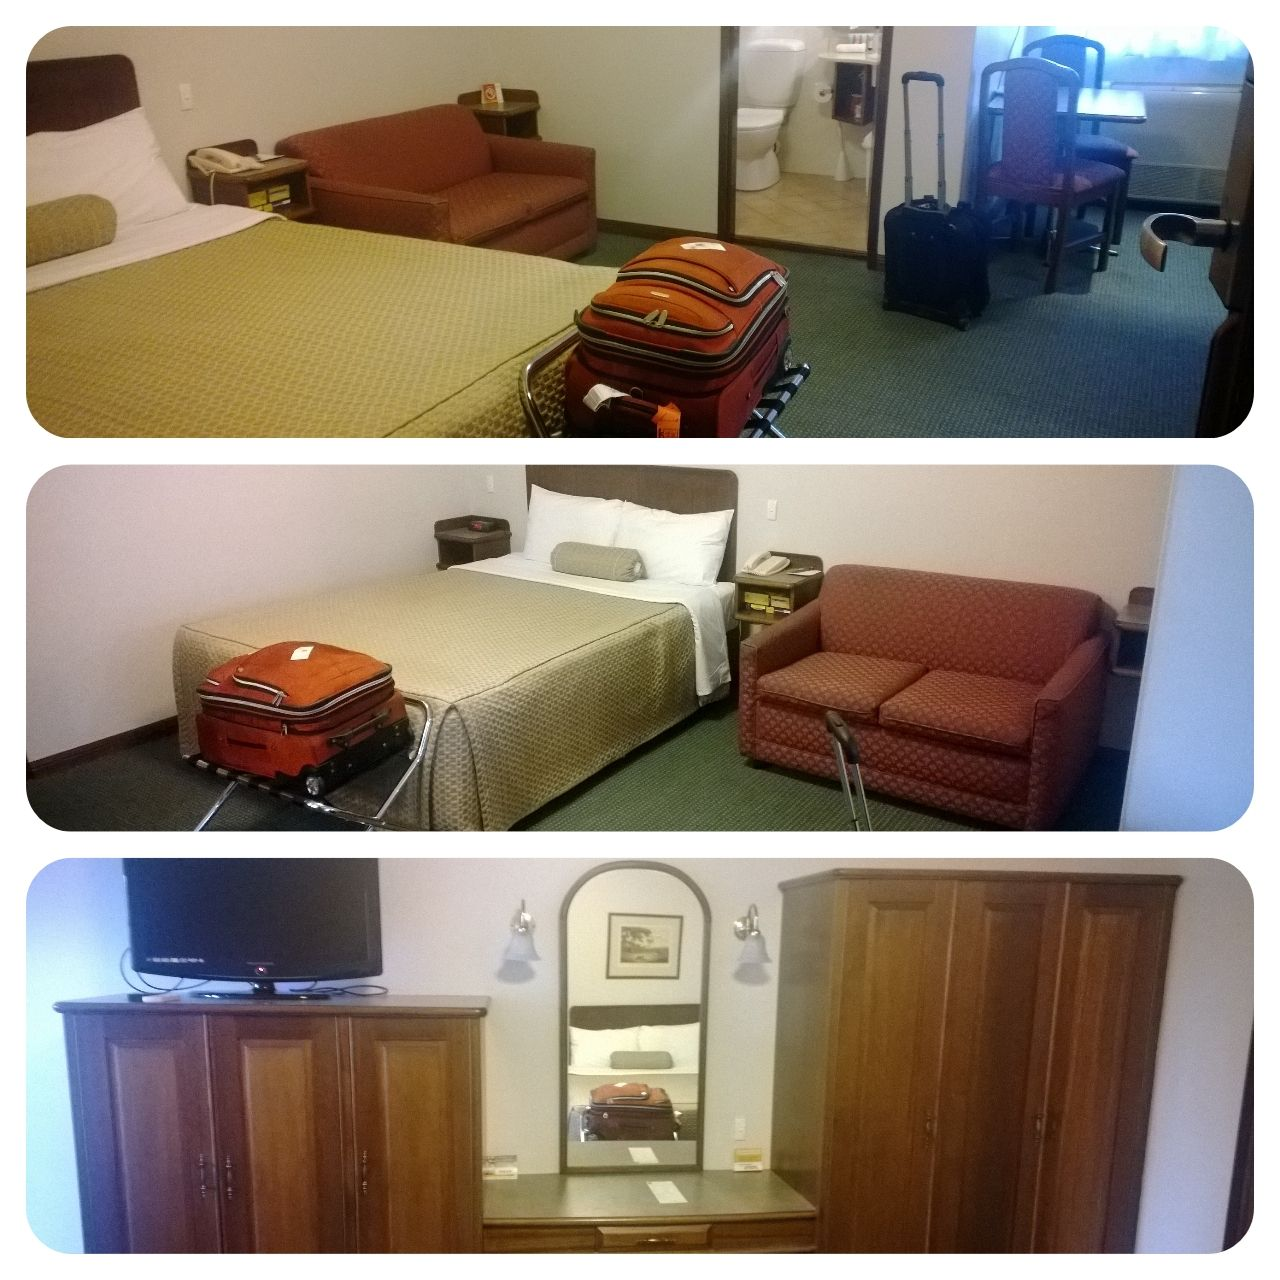 Adelaide, AUS. March 2014 Home decor, Decor, Furniture